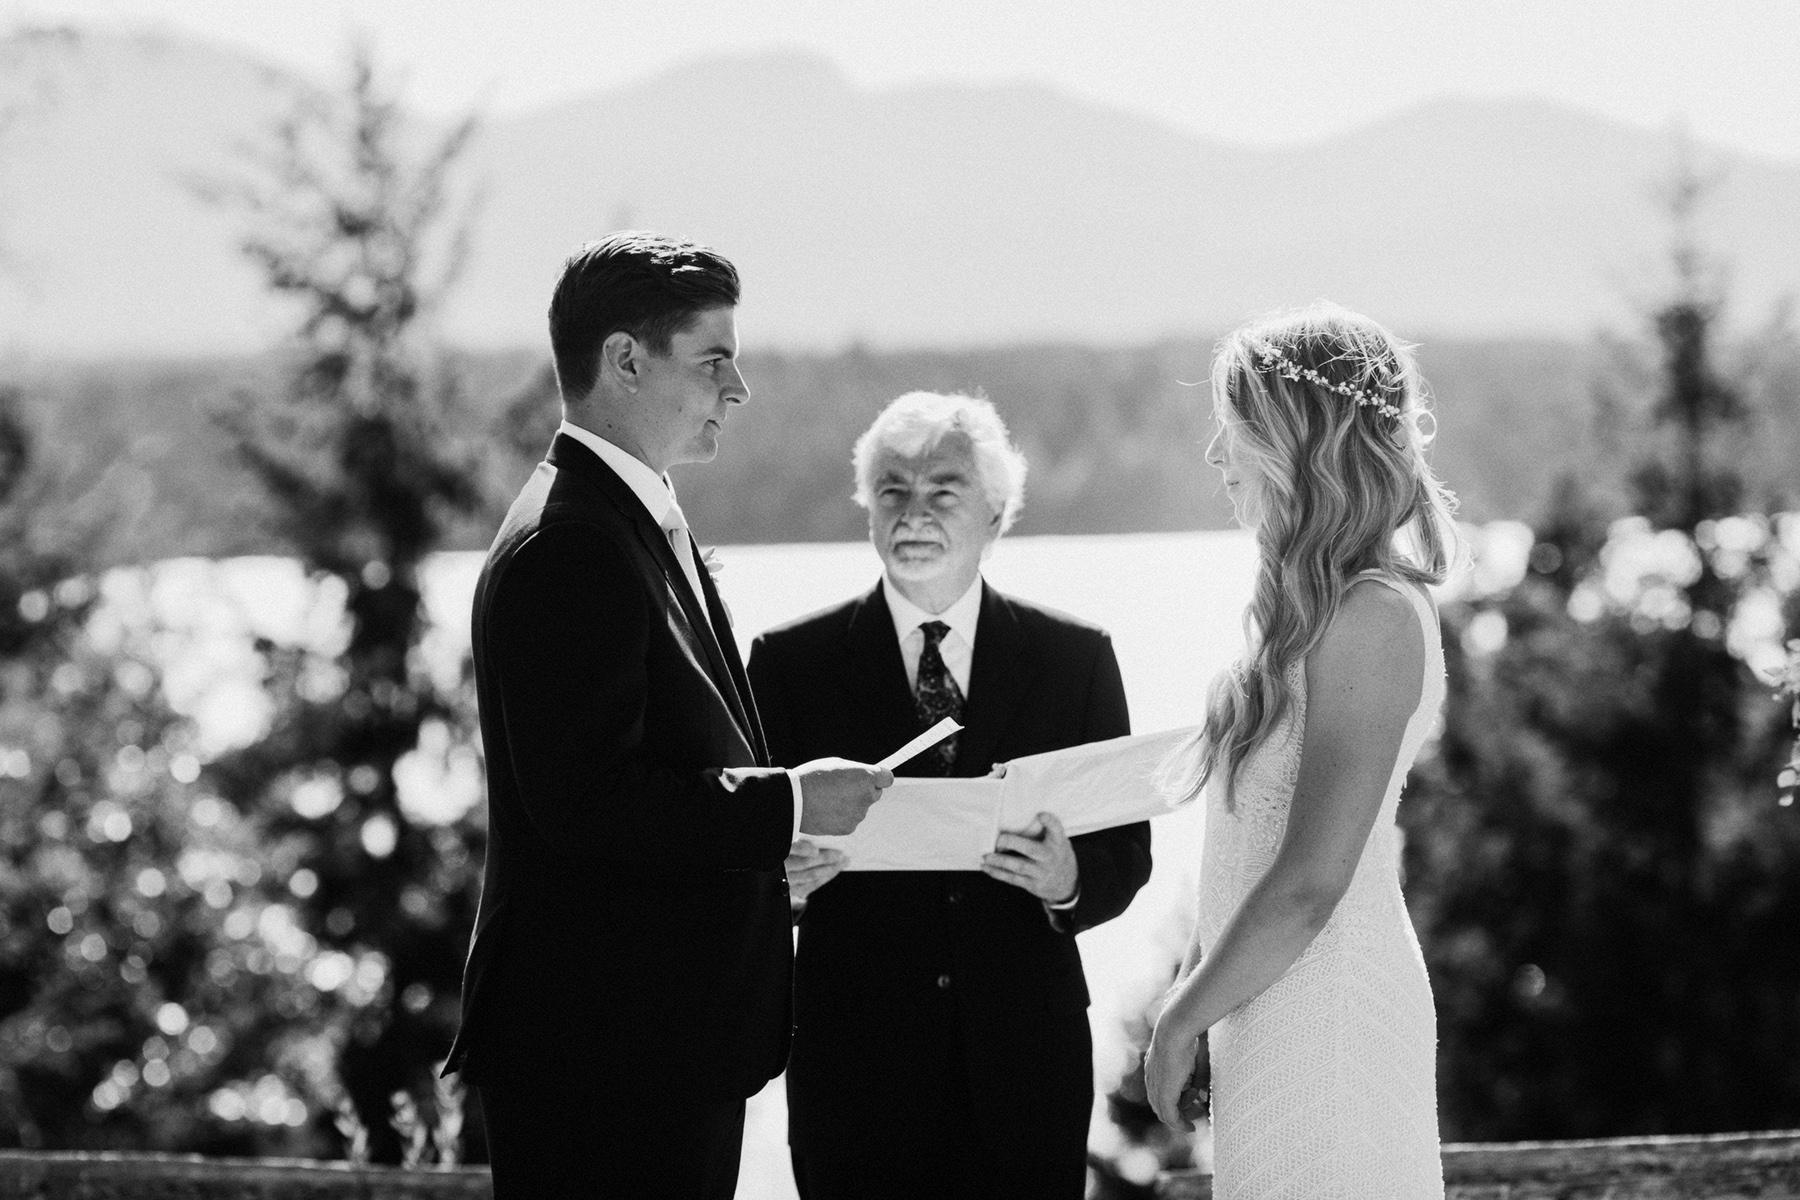 galiano-island-bodega-destination-wedding-0059.JPG